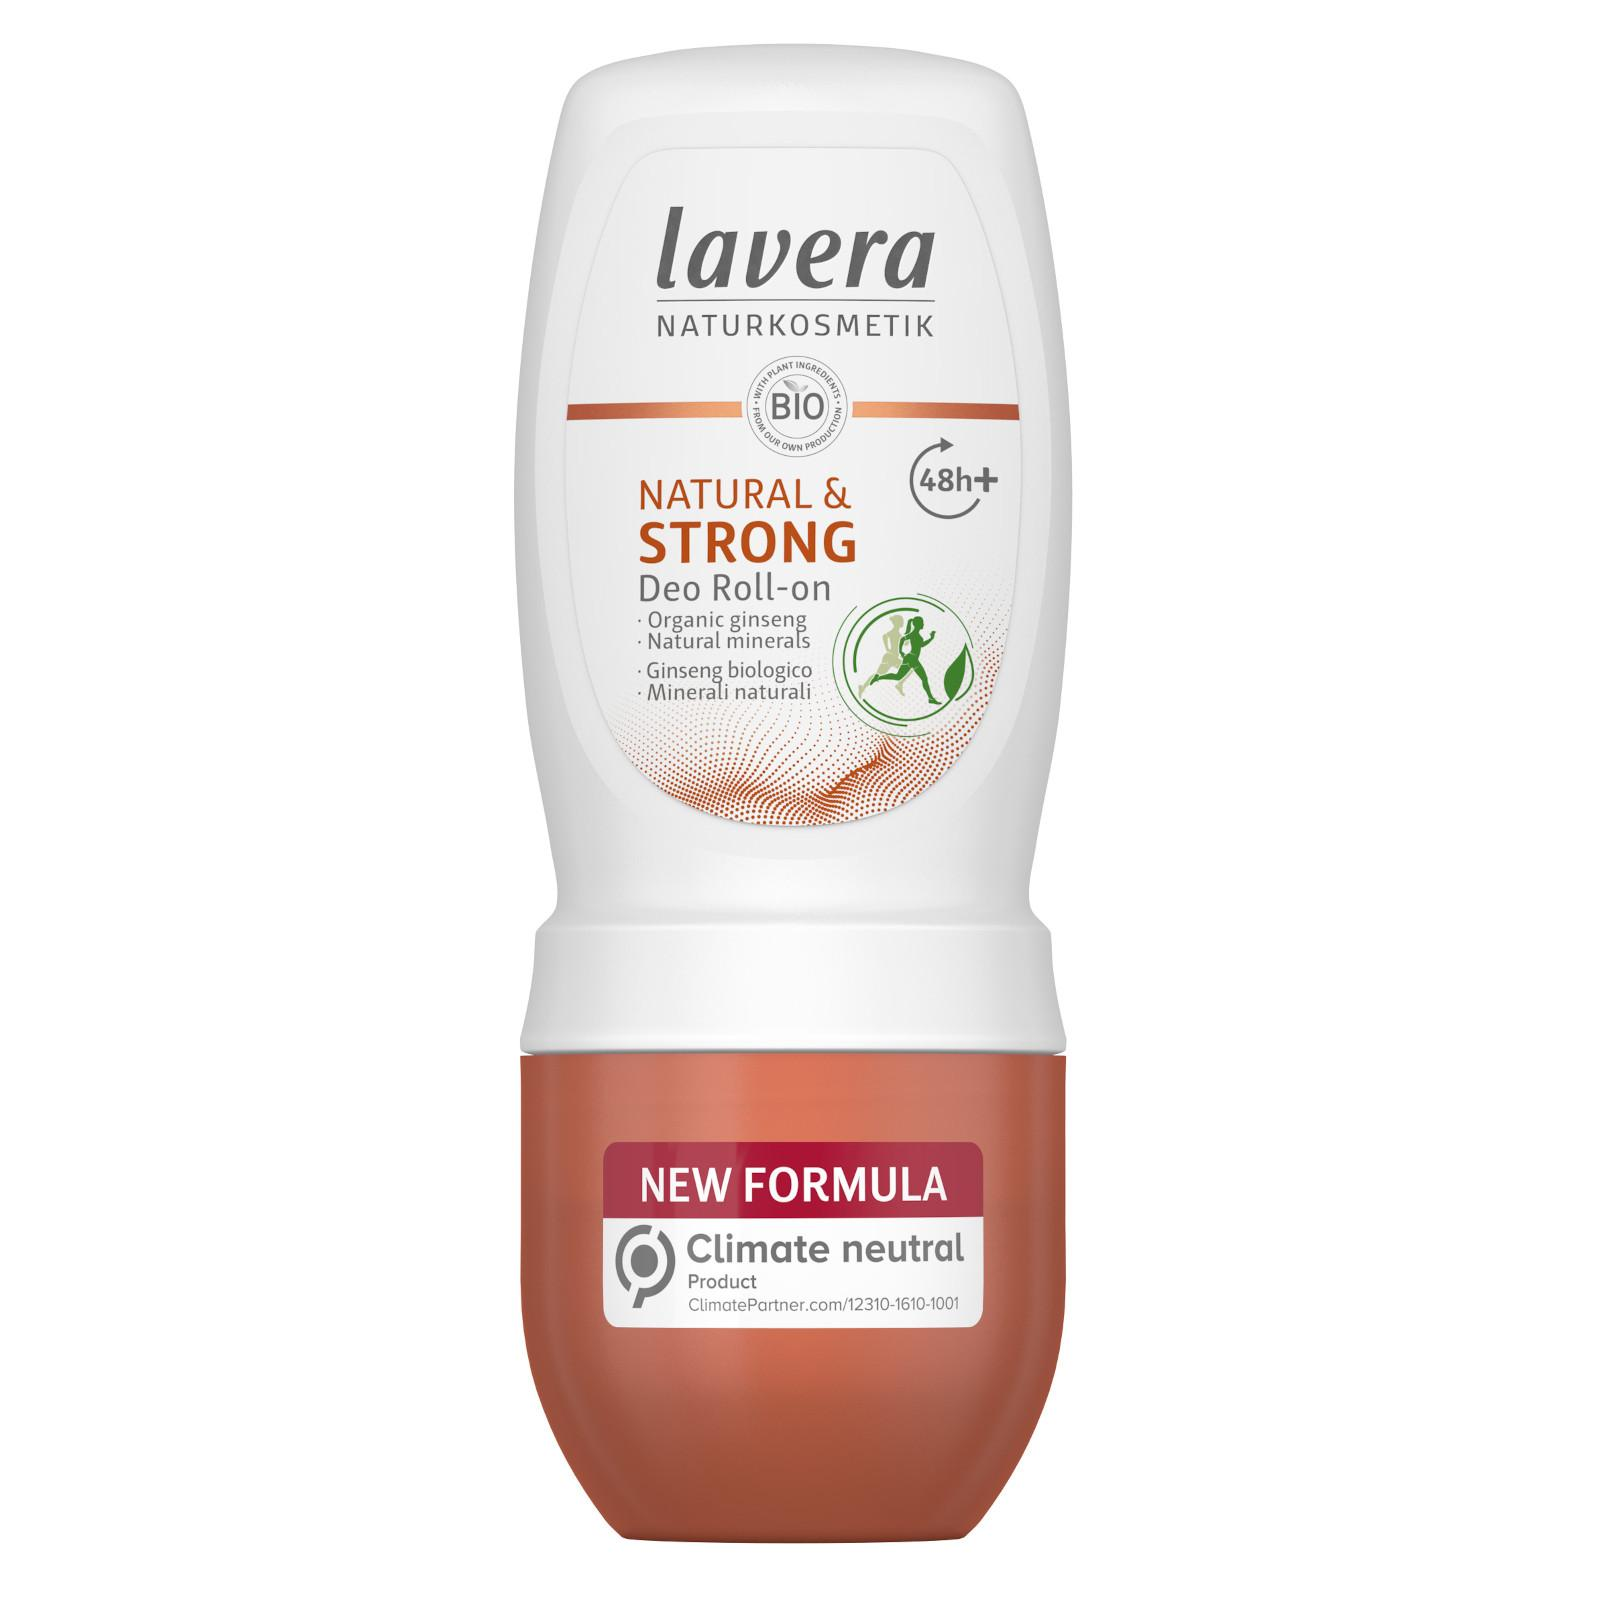 Lavera Deodorant roll-on Strong pro ochranu až 48 hodin 50 ml